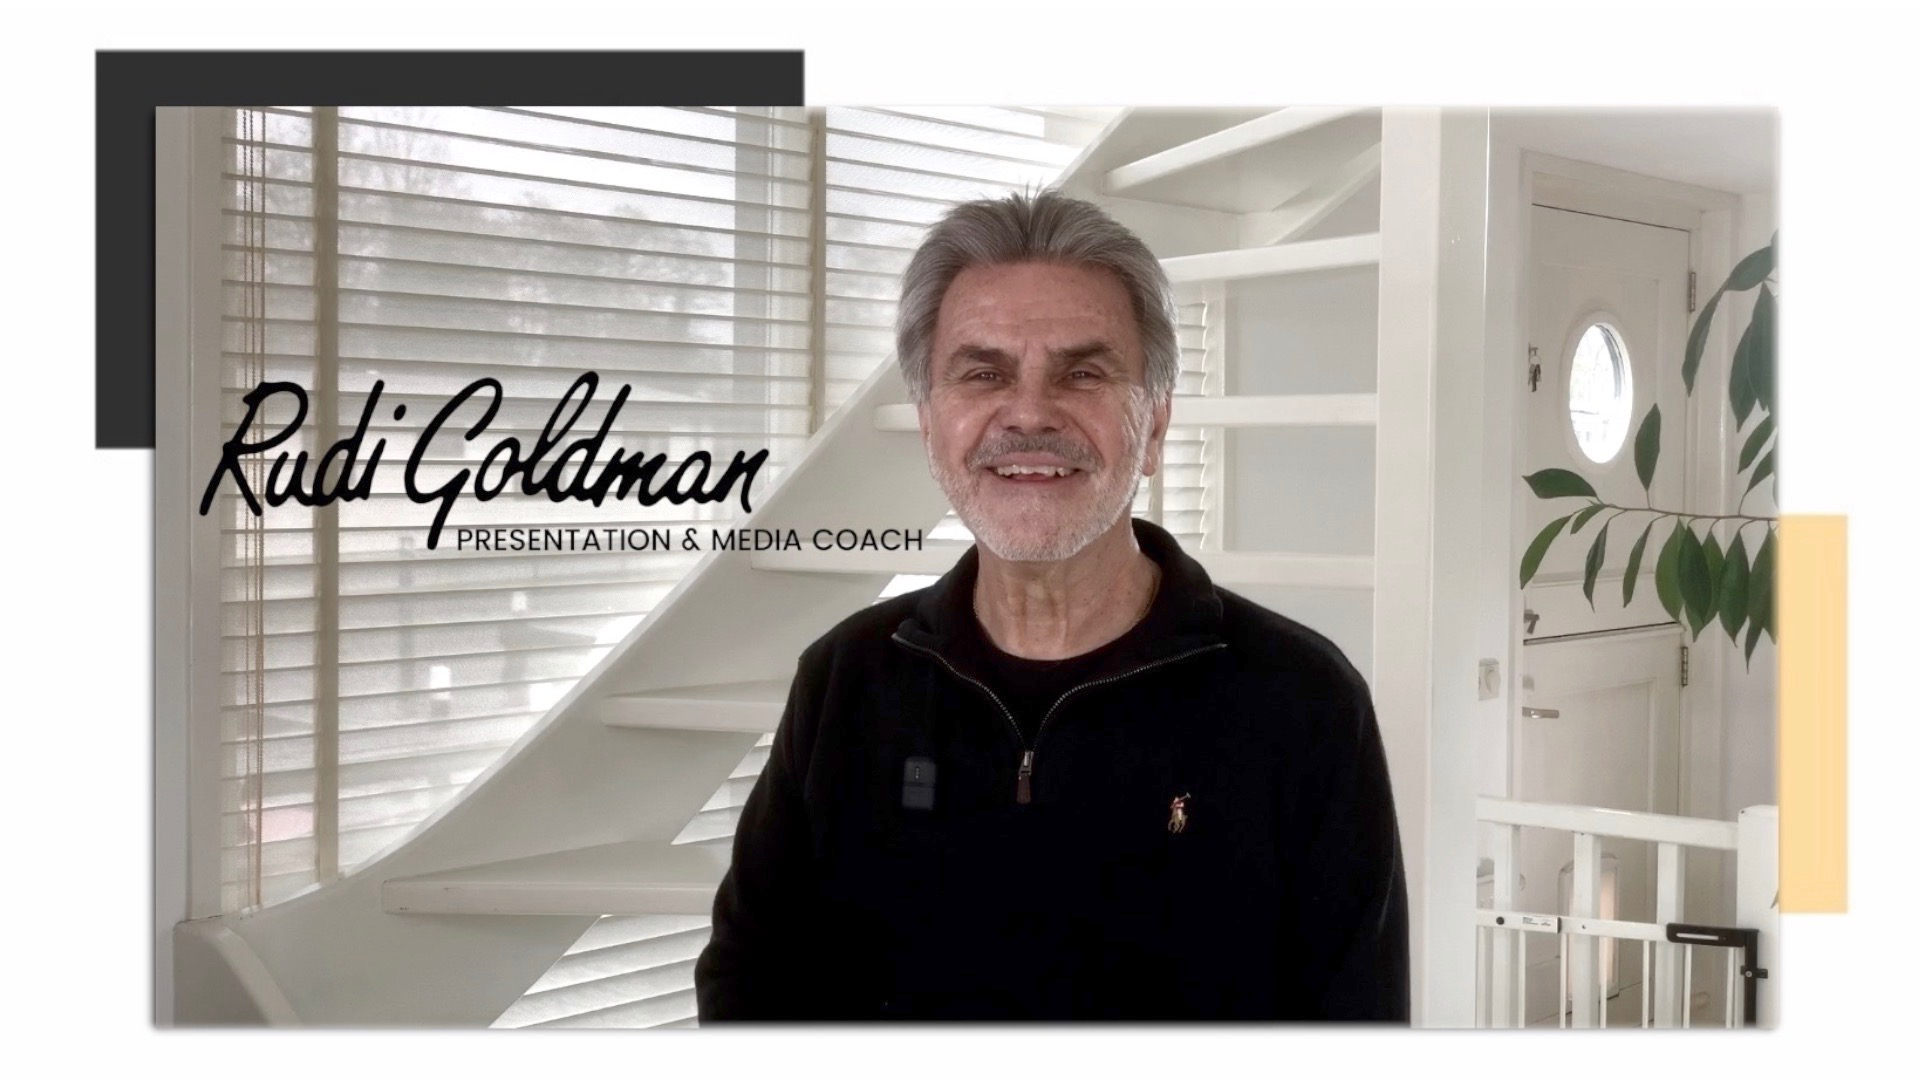 Rudi Goldman - Presentation & Media Coach